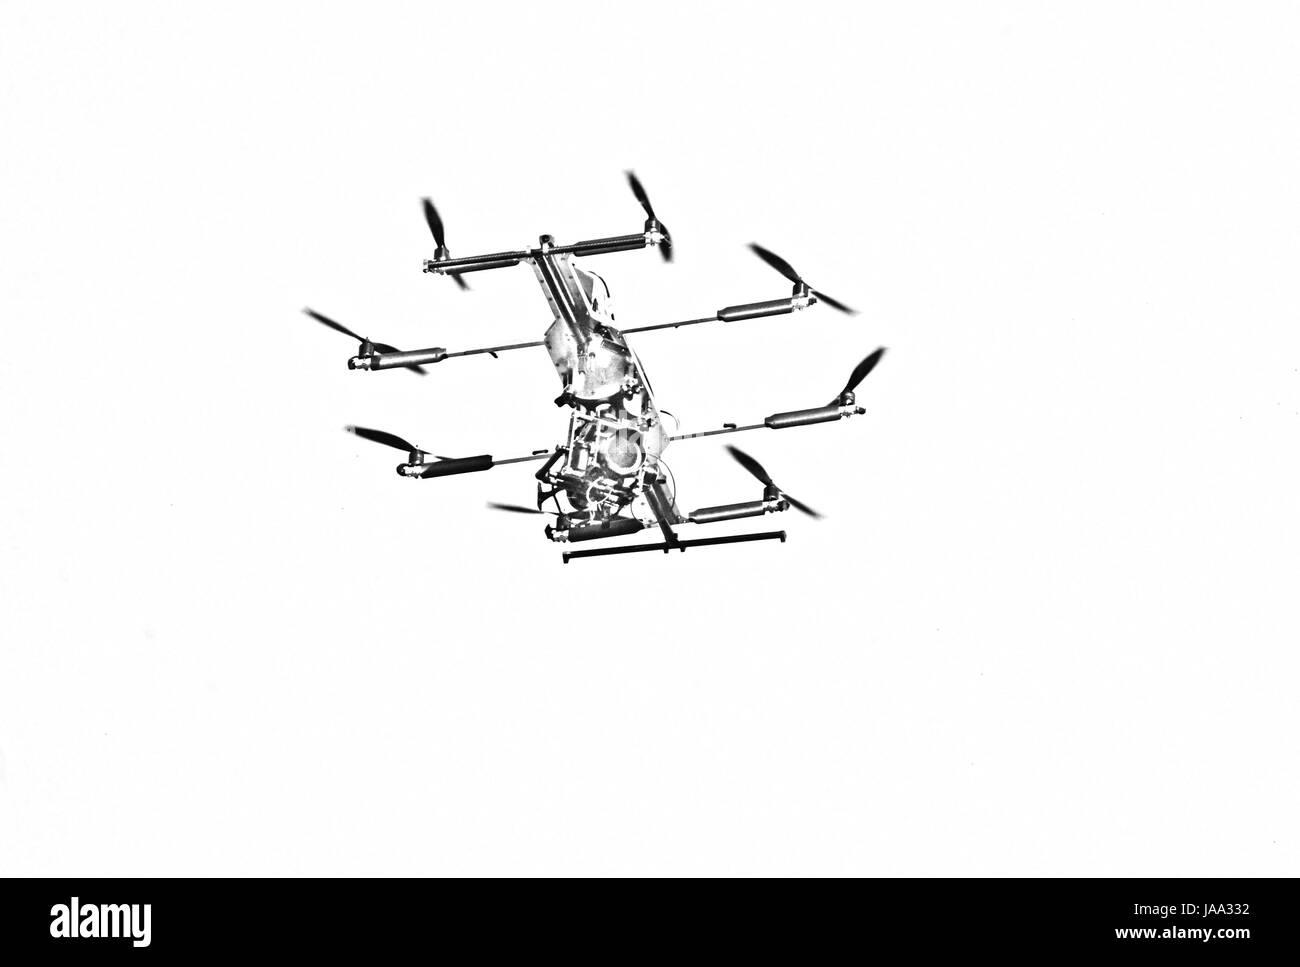 Drone Flight, Hamburg, Germany - Stock Image